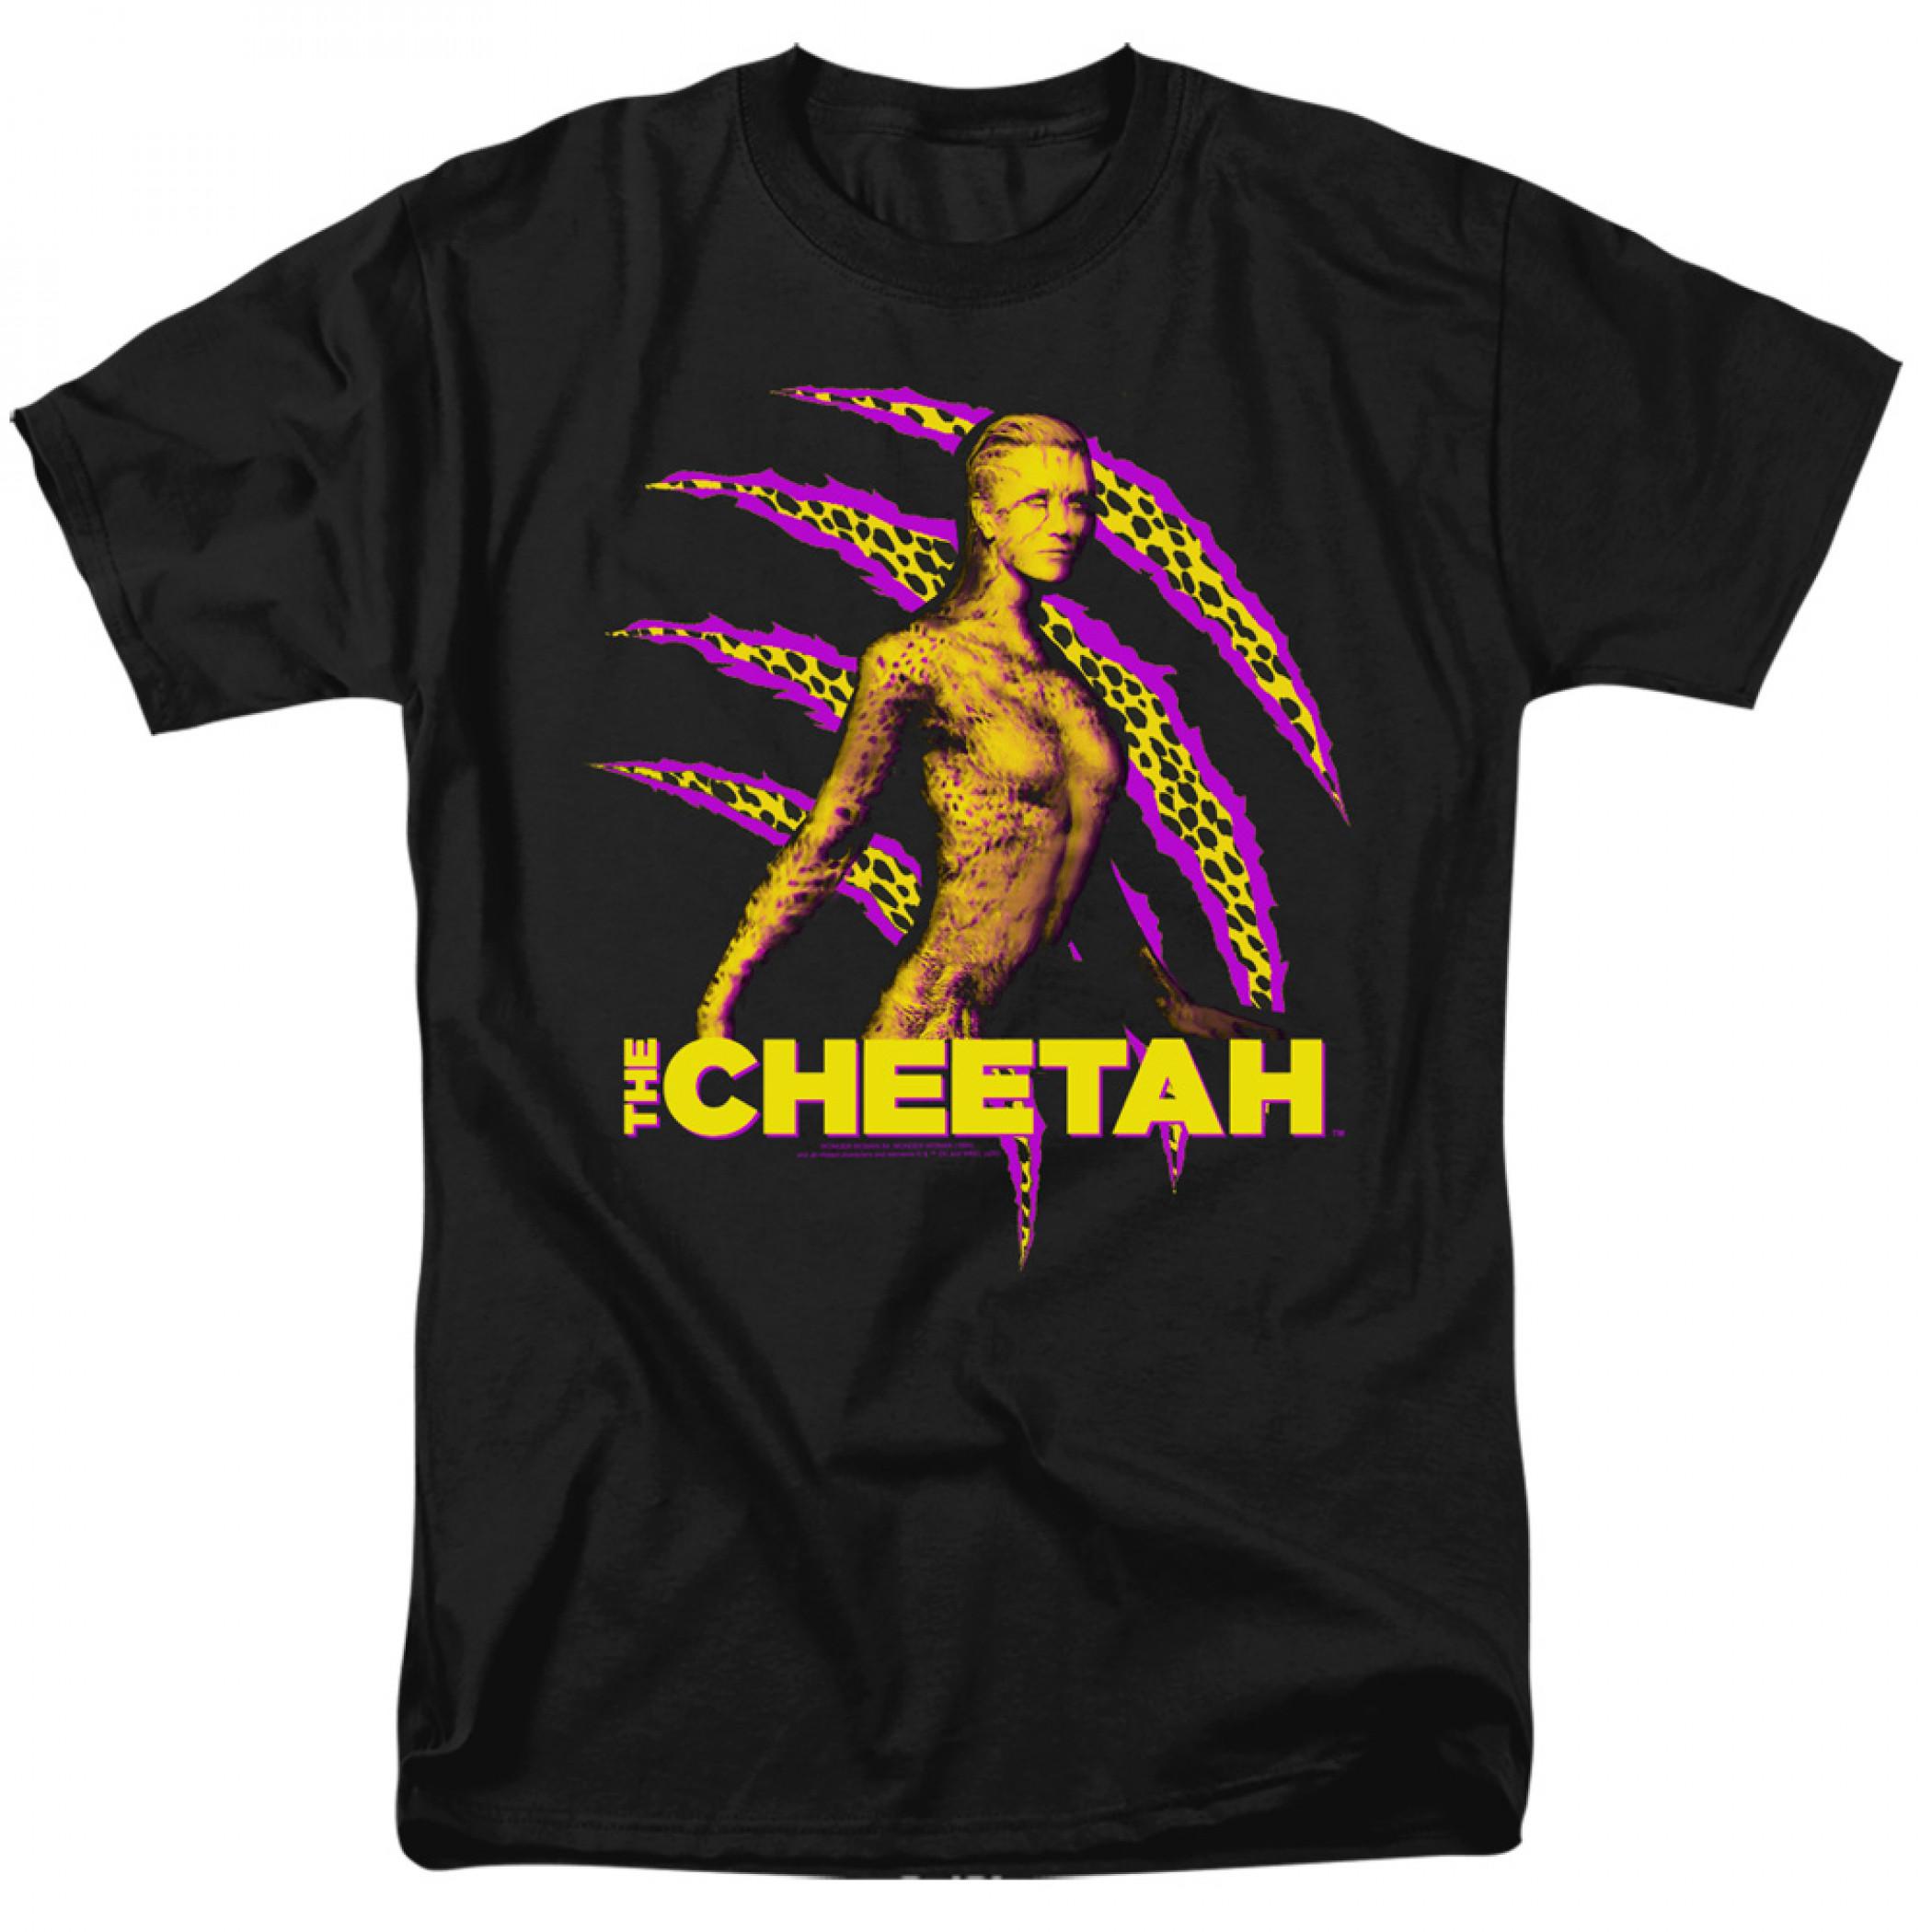 Wonder Woman 1984 Movie The Cheetah T-shirt